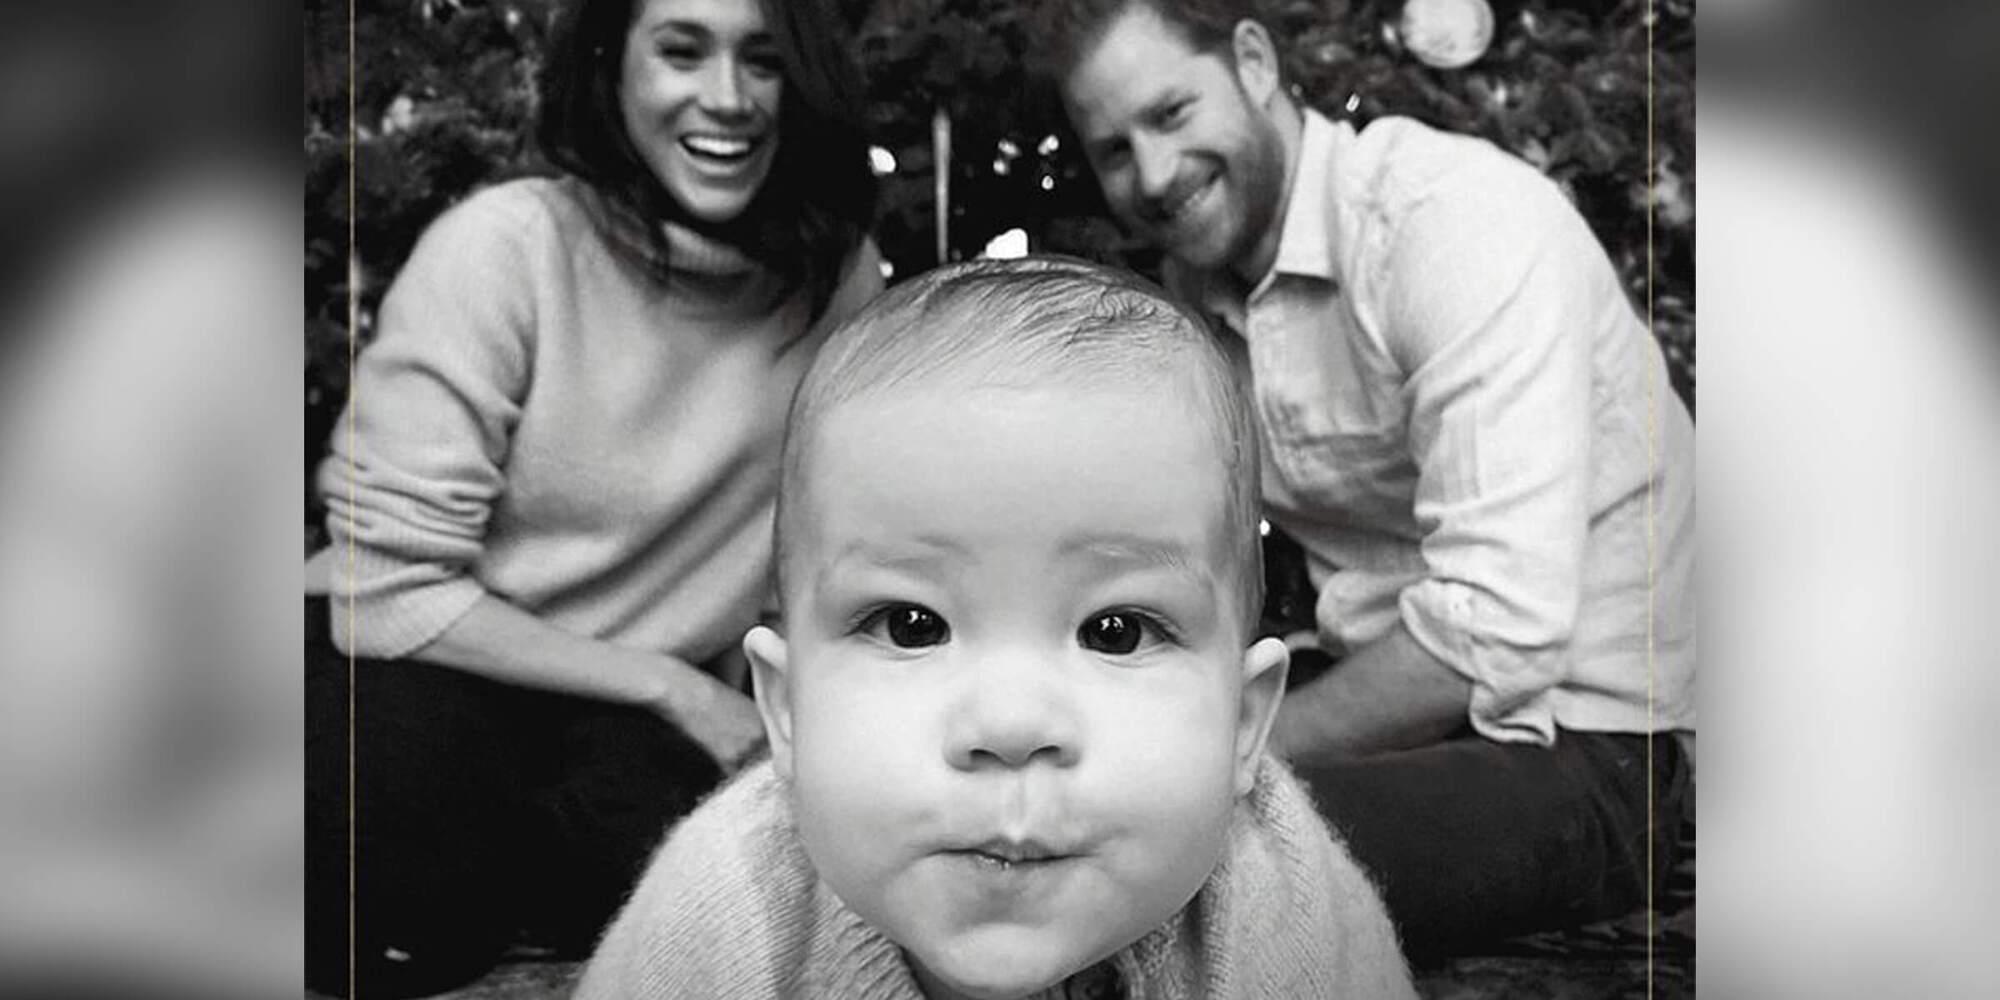 Гарри и Меган с сыном Арчи